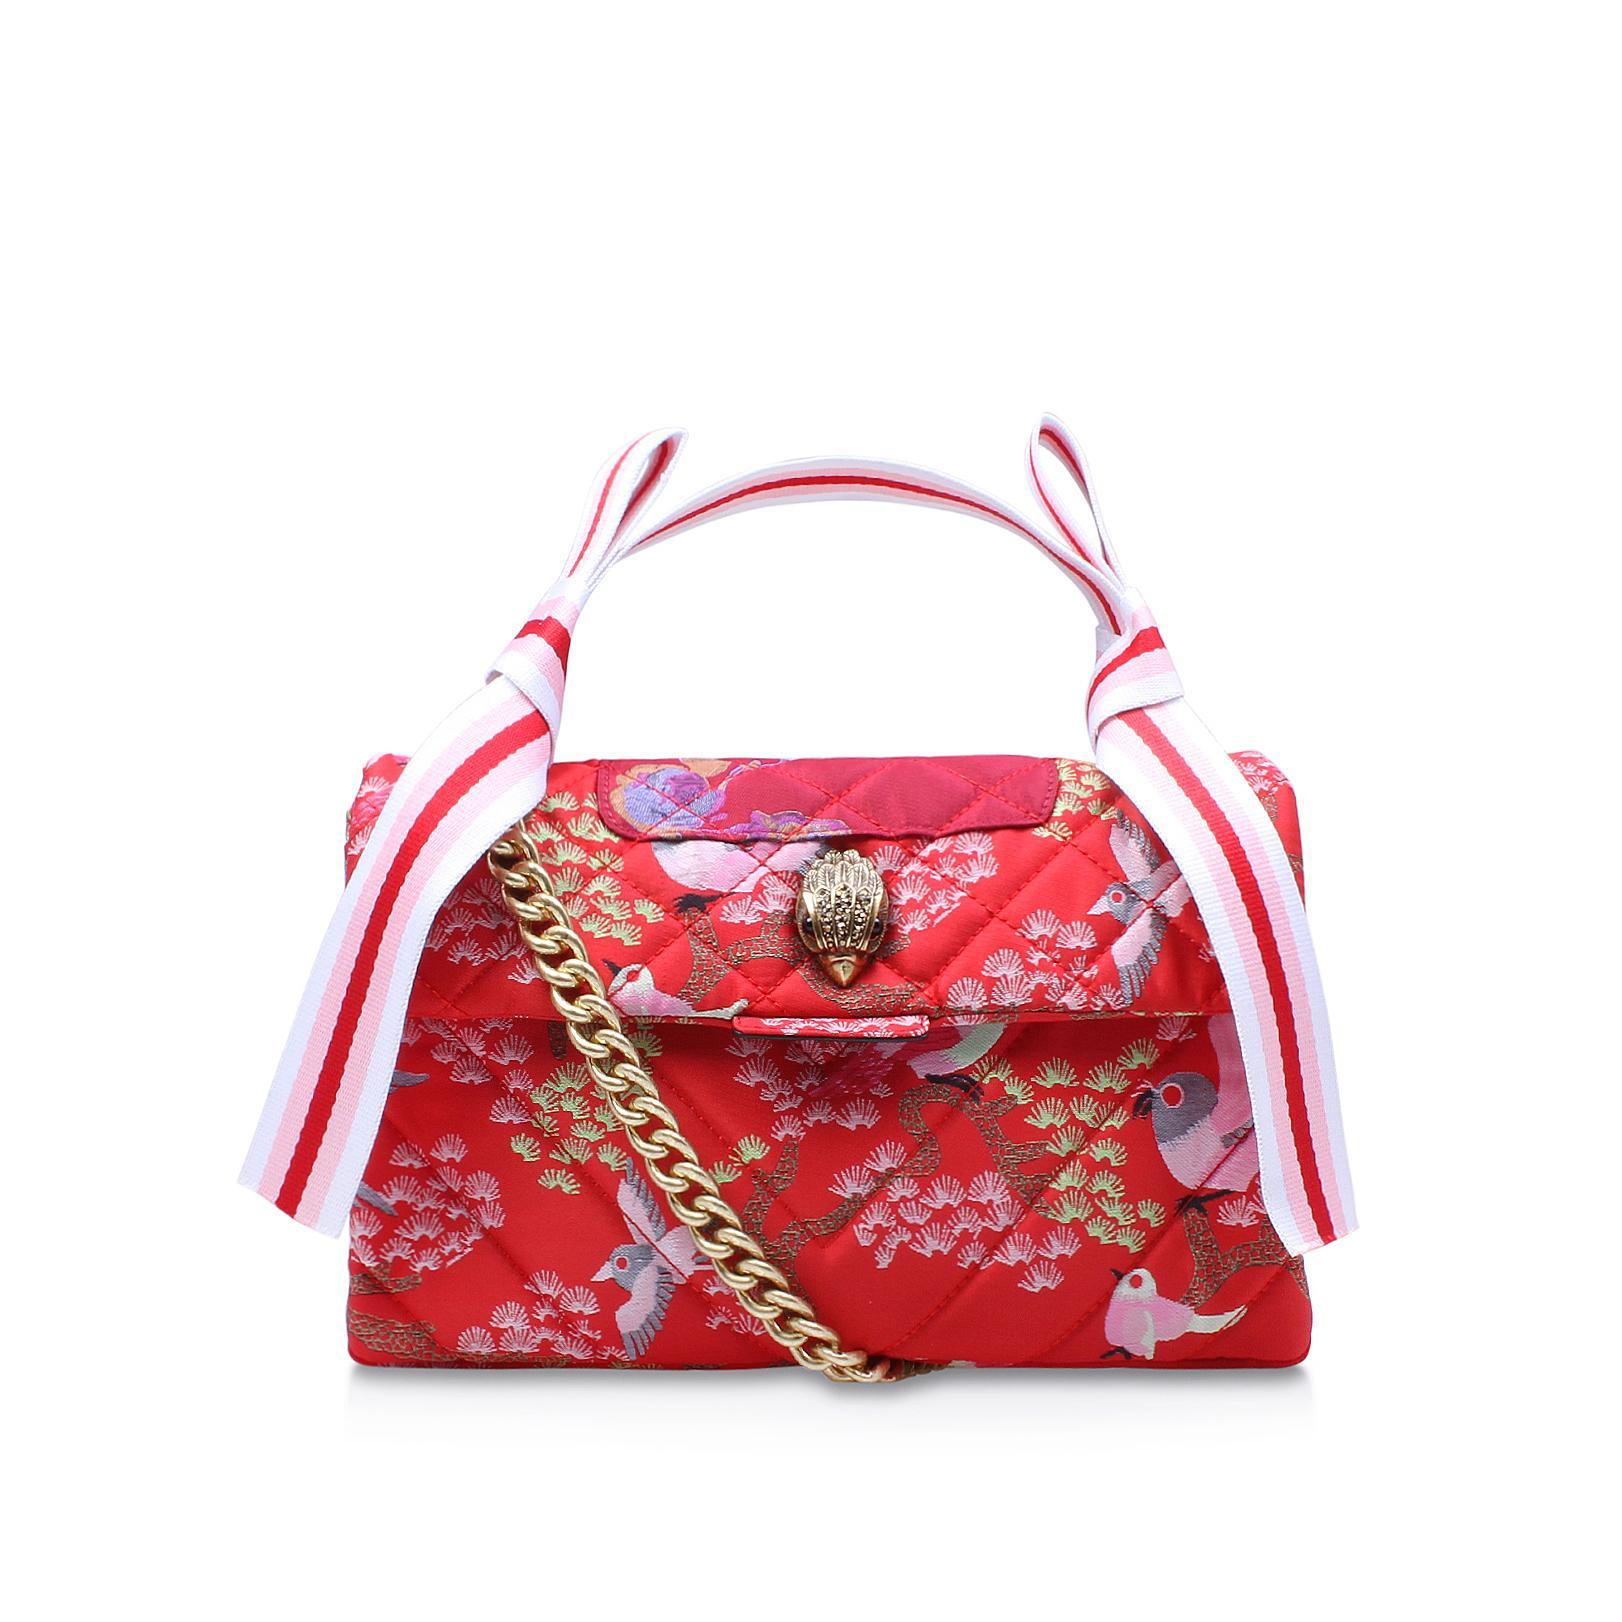 Kurt Geiger Fabric Kensington Bag In Red Lyst